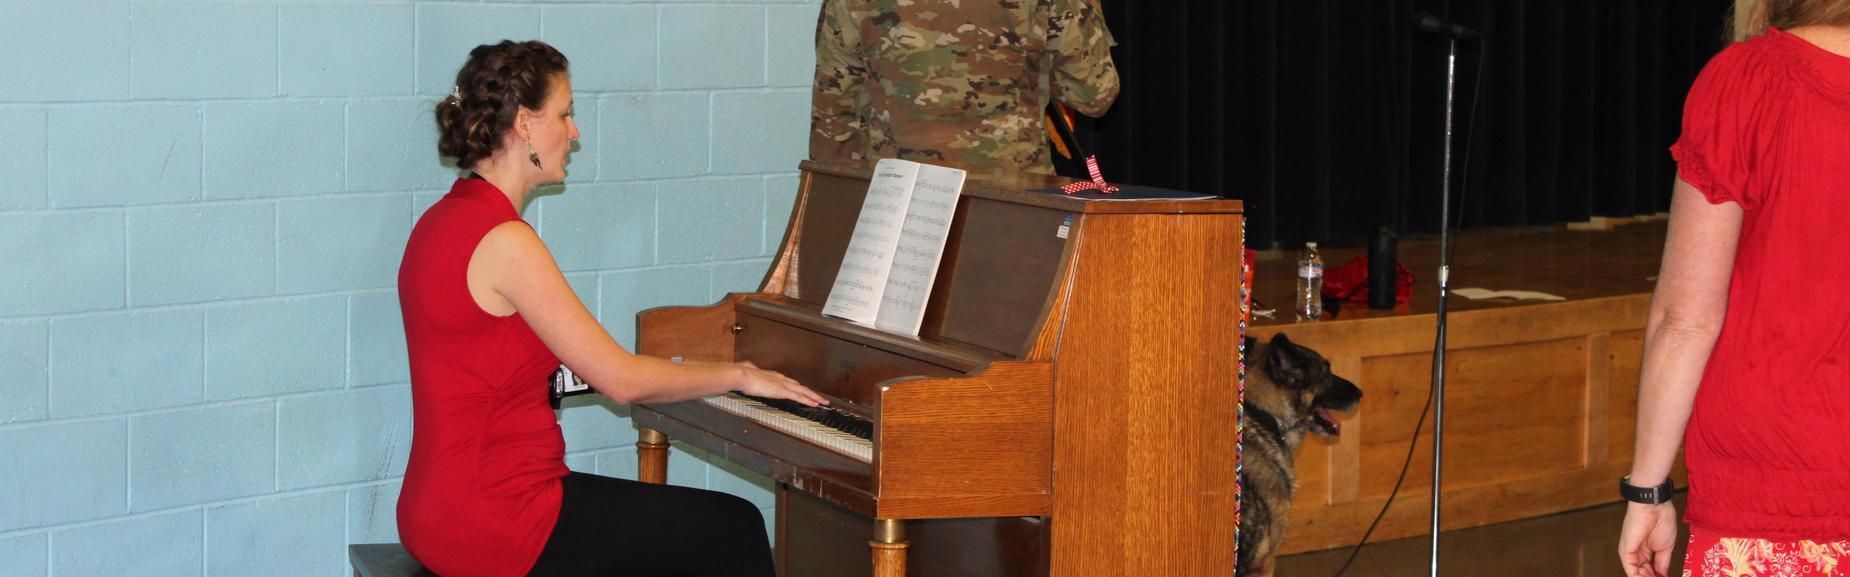 Mrs. Baron Sharing Her Gift of Music